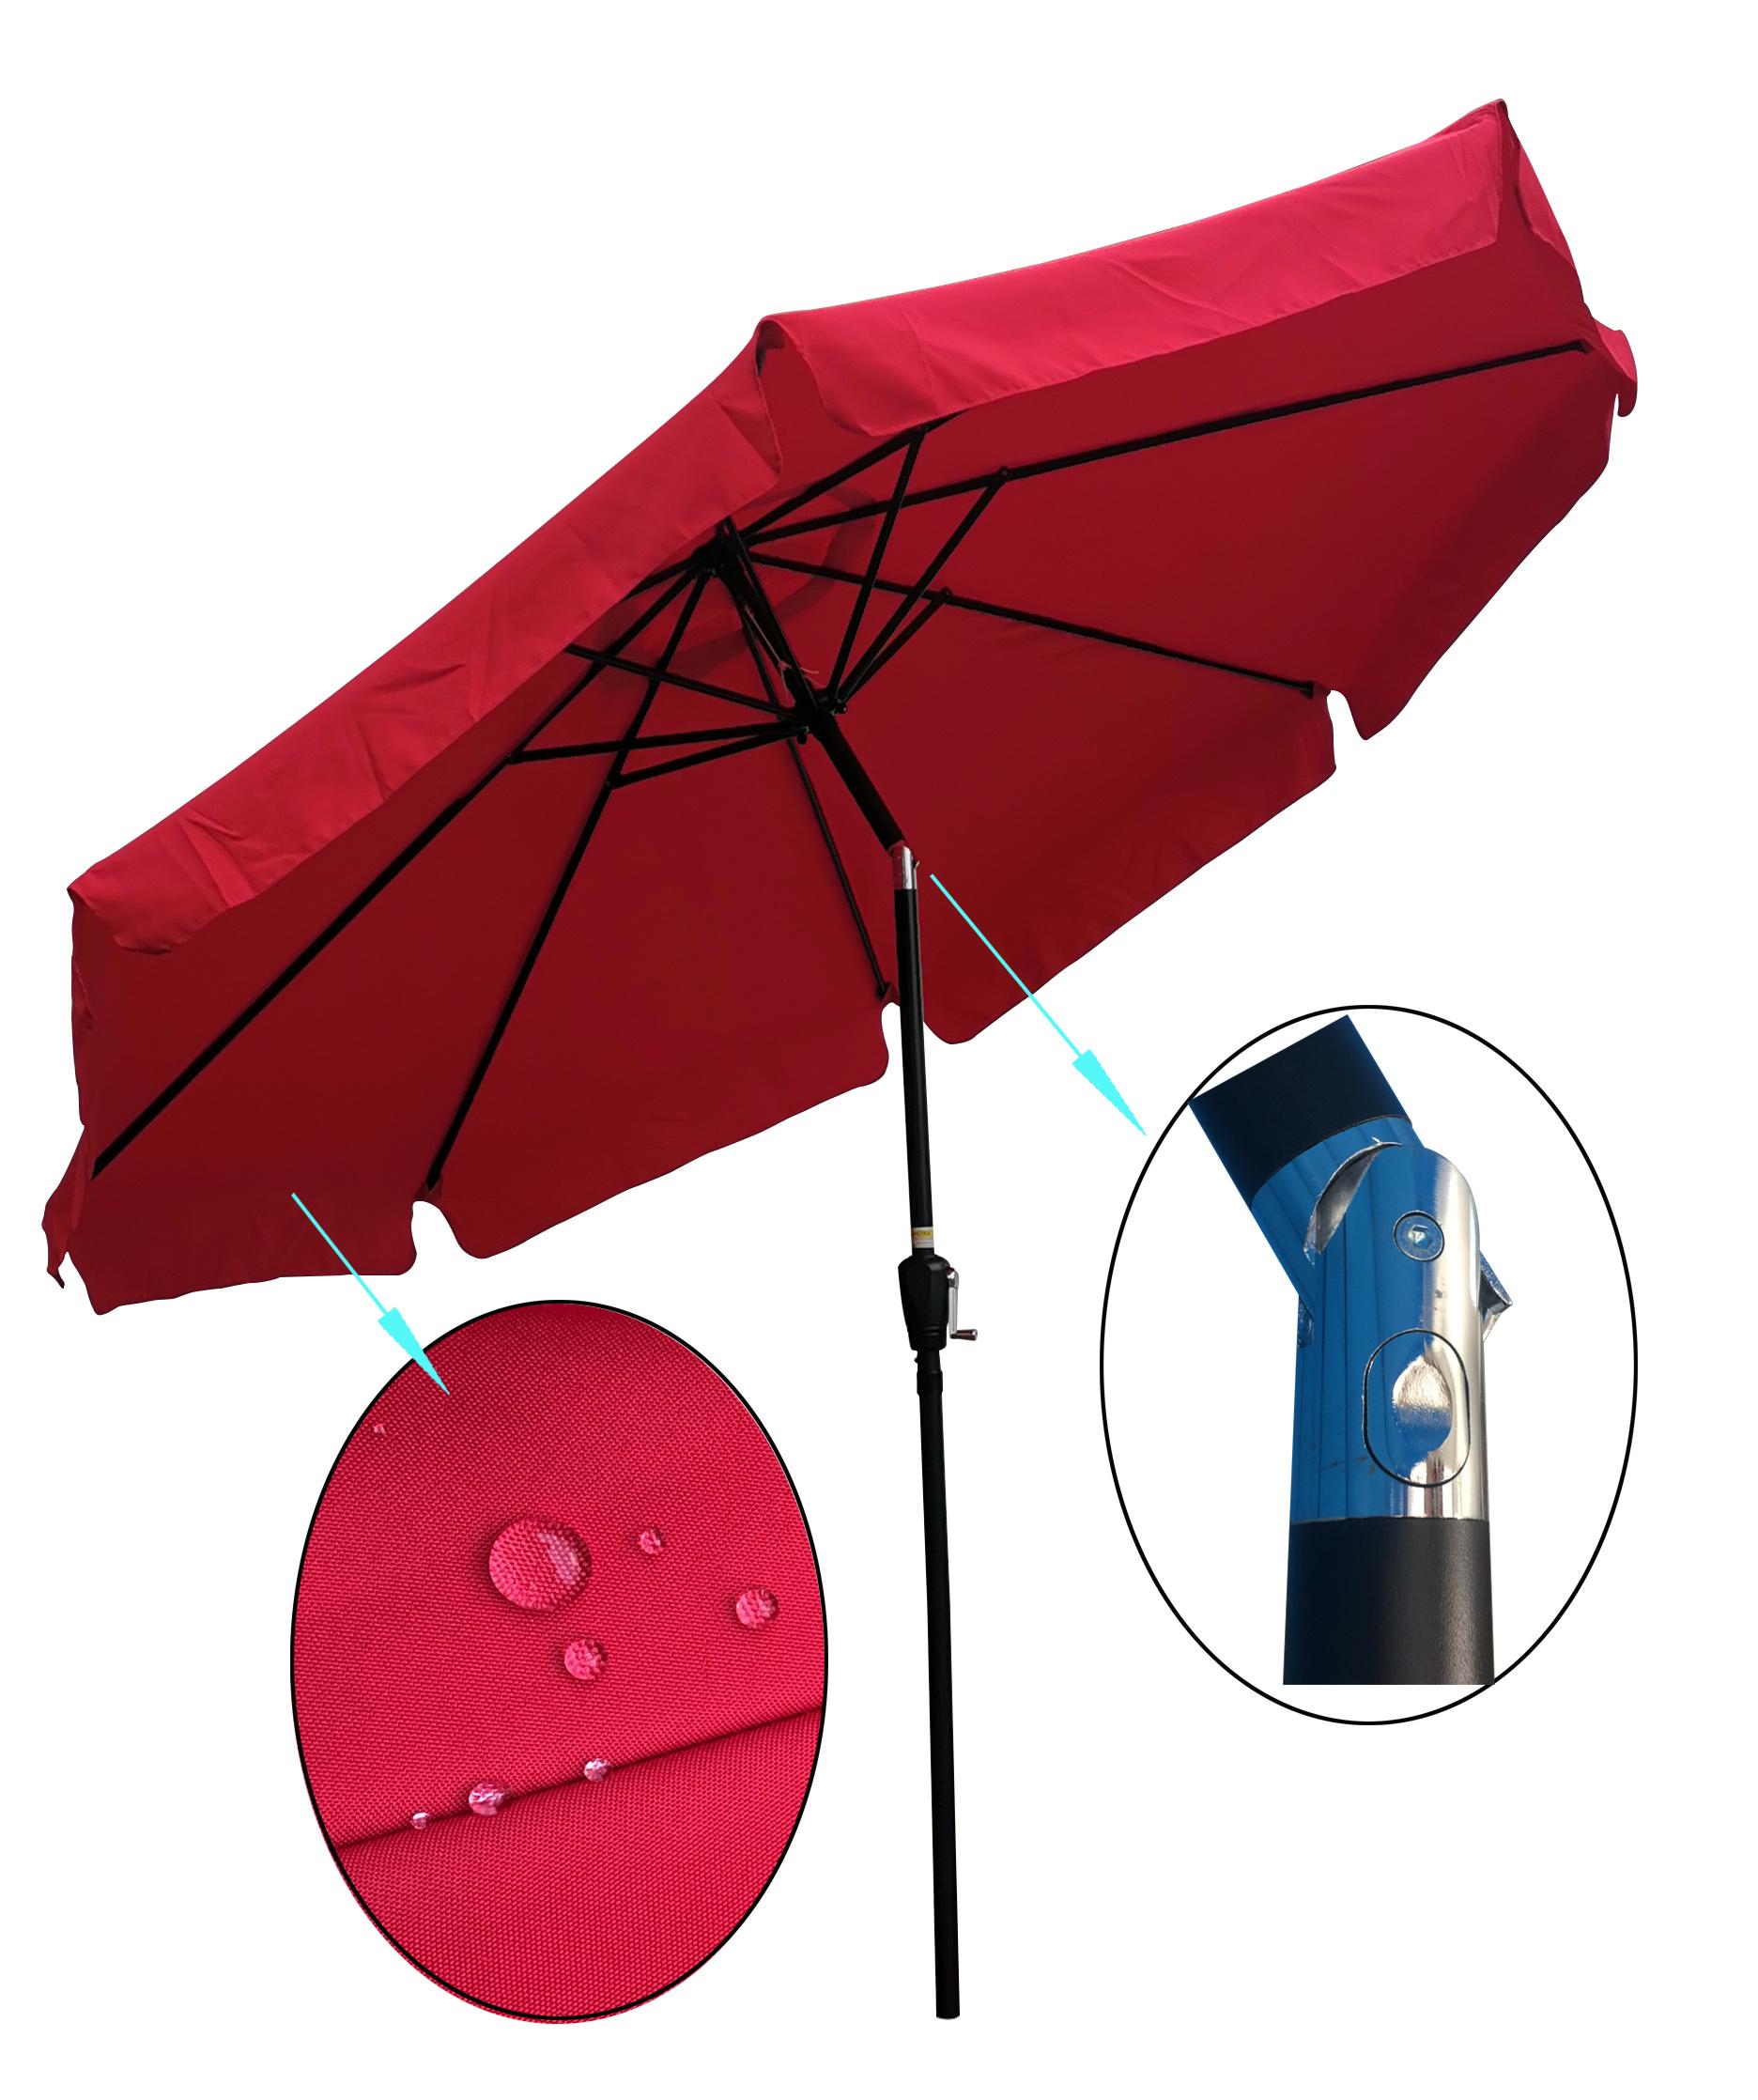 [US Direct] 10ft Patio Umbrella Market Table Round Umbrella Outdoor Garden Umbrellas with Crank and Push Button Tilt for Pool Shade Outside